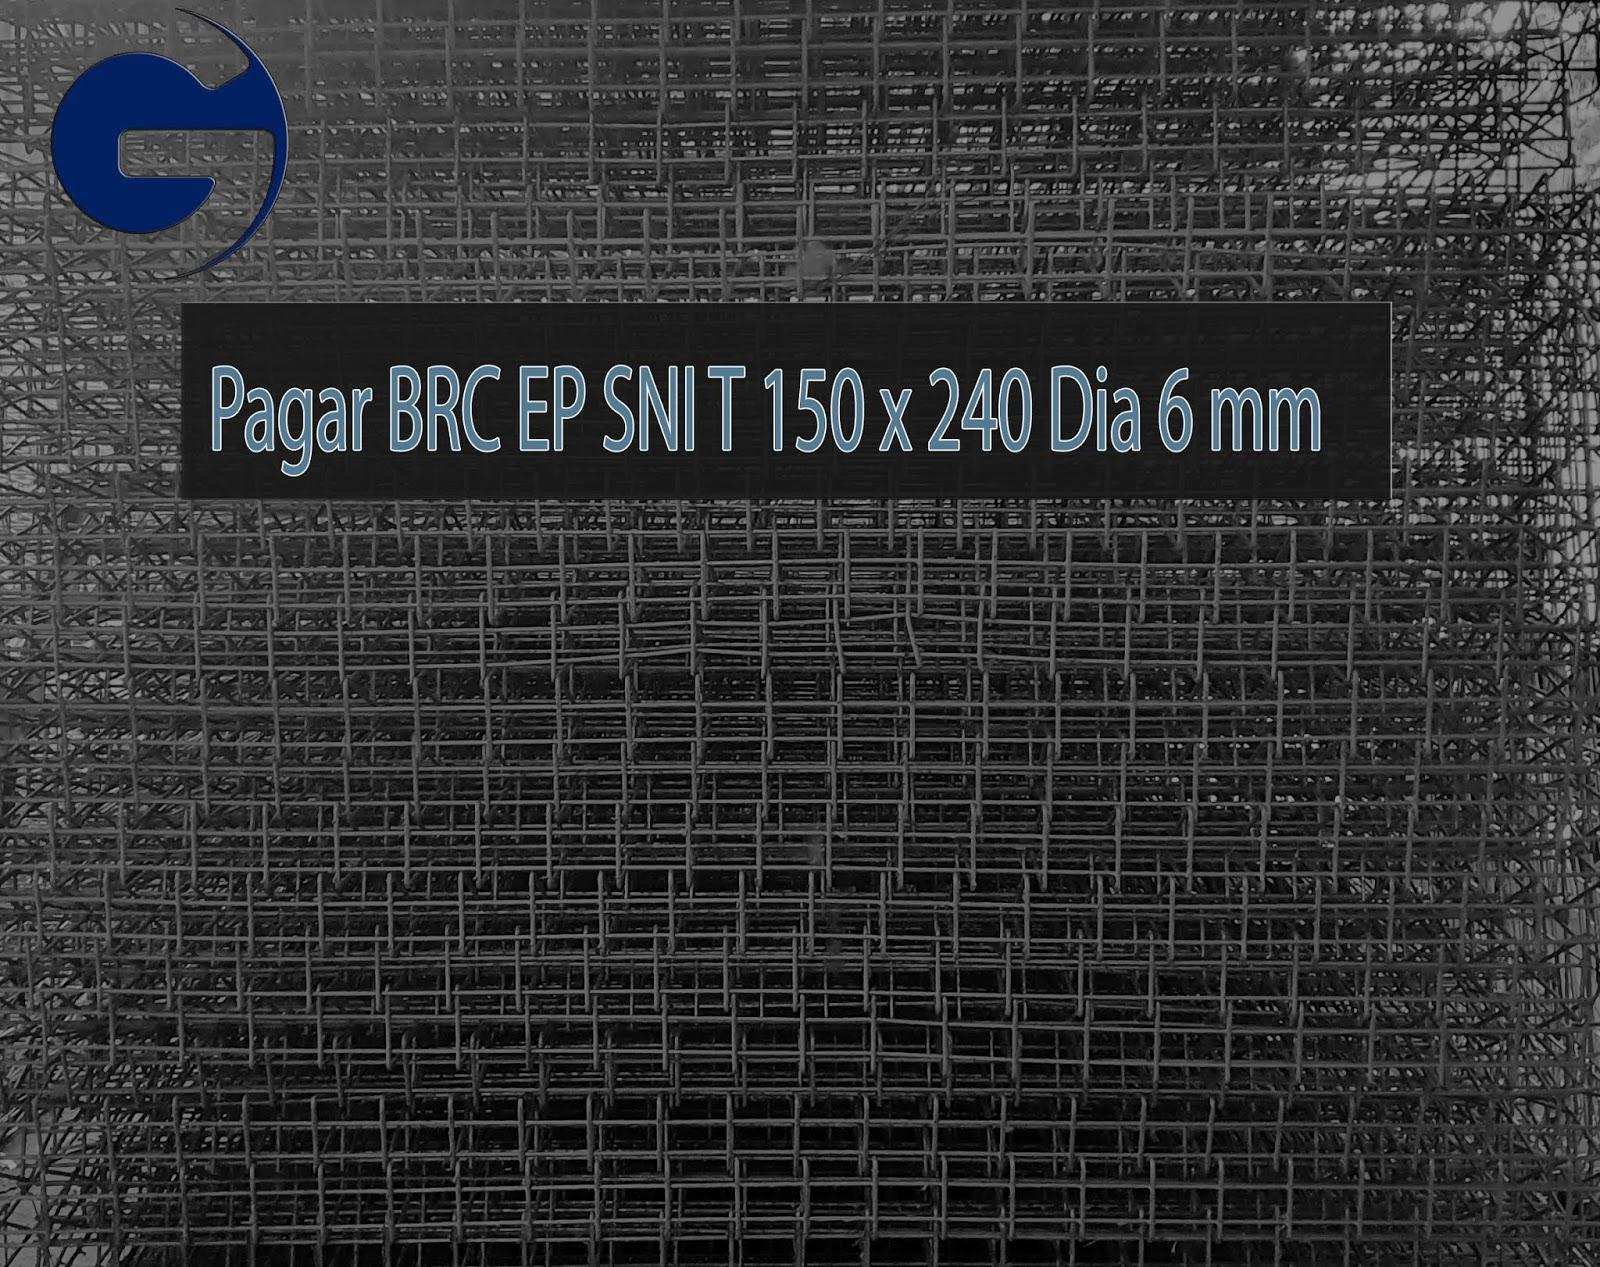 Jual Pagar BRC EP SNI T 150 x 240 Dia 6 mm